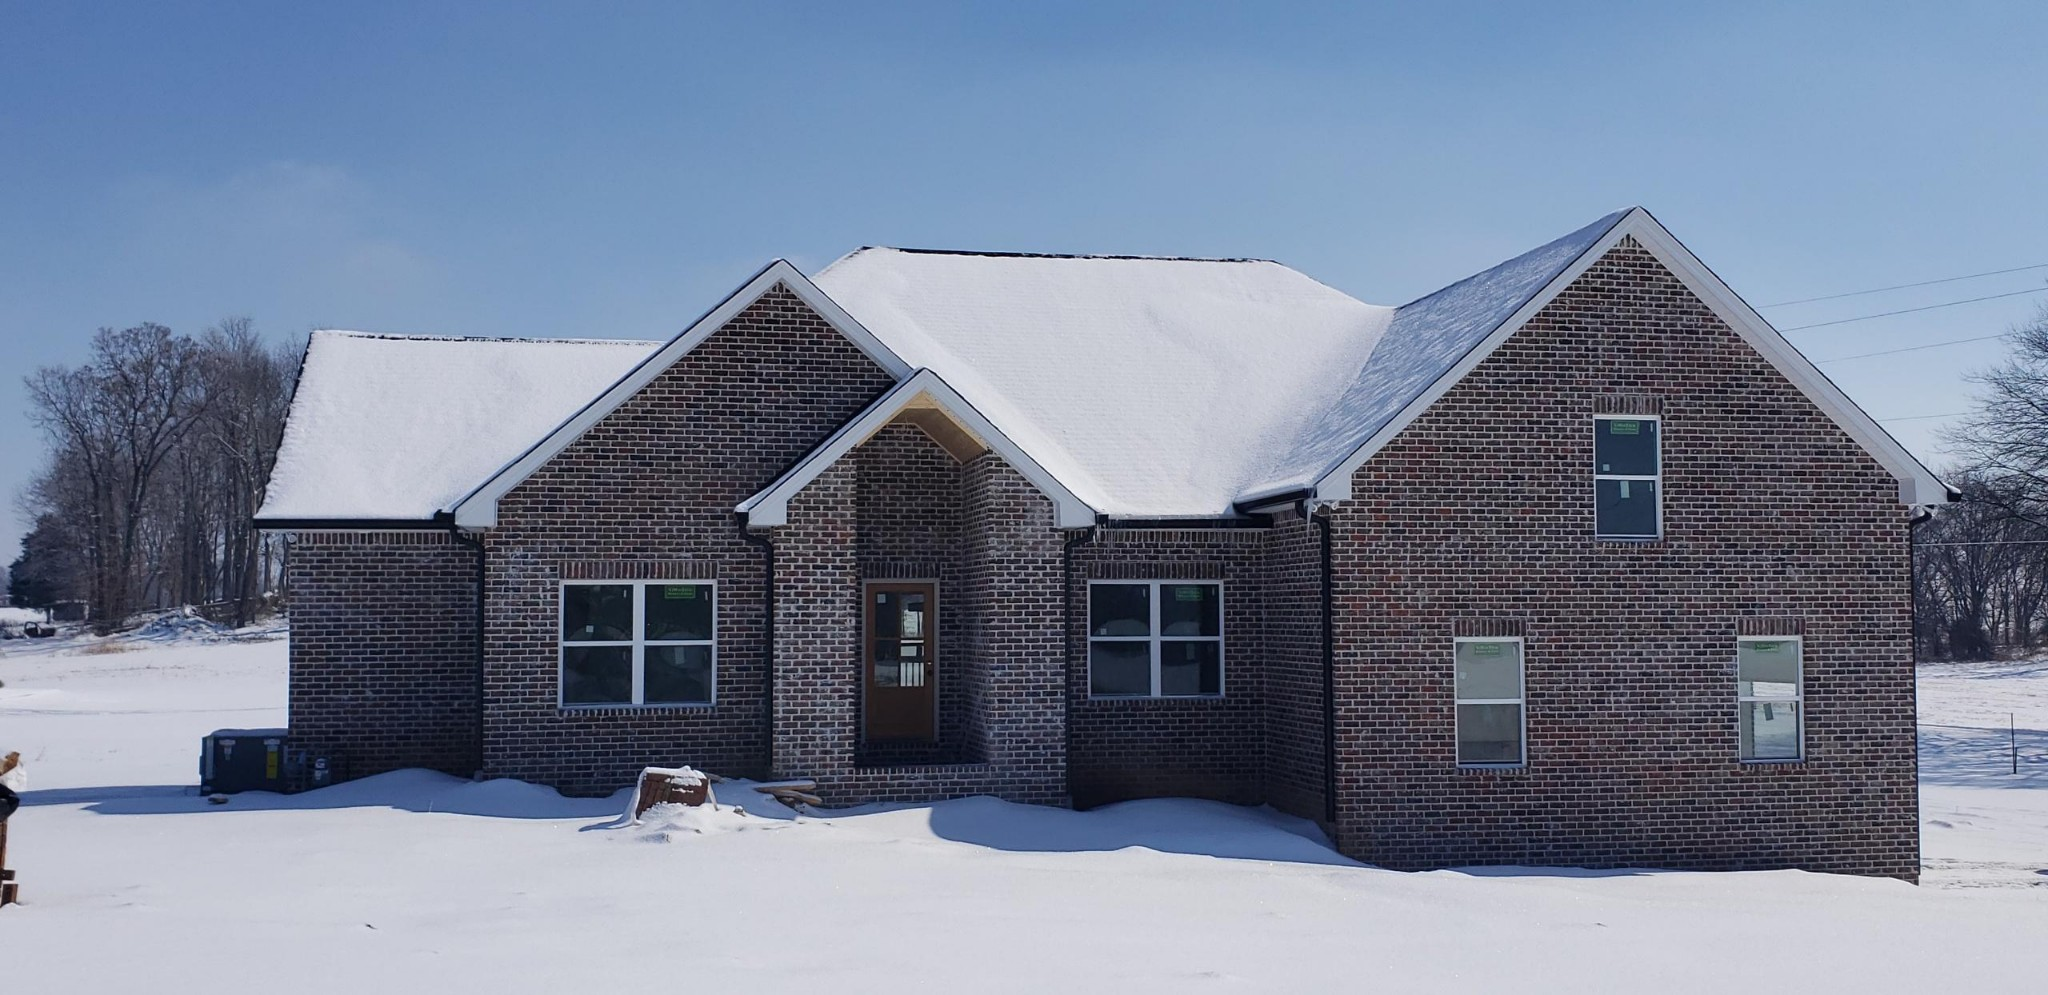 1024 Friendship Rd Property Photo - Cross Plains, TN real estate listing